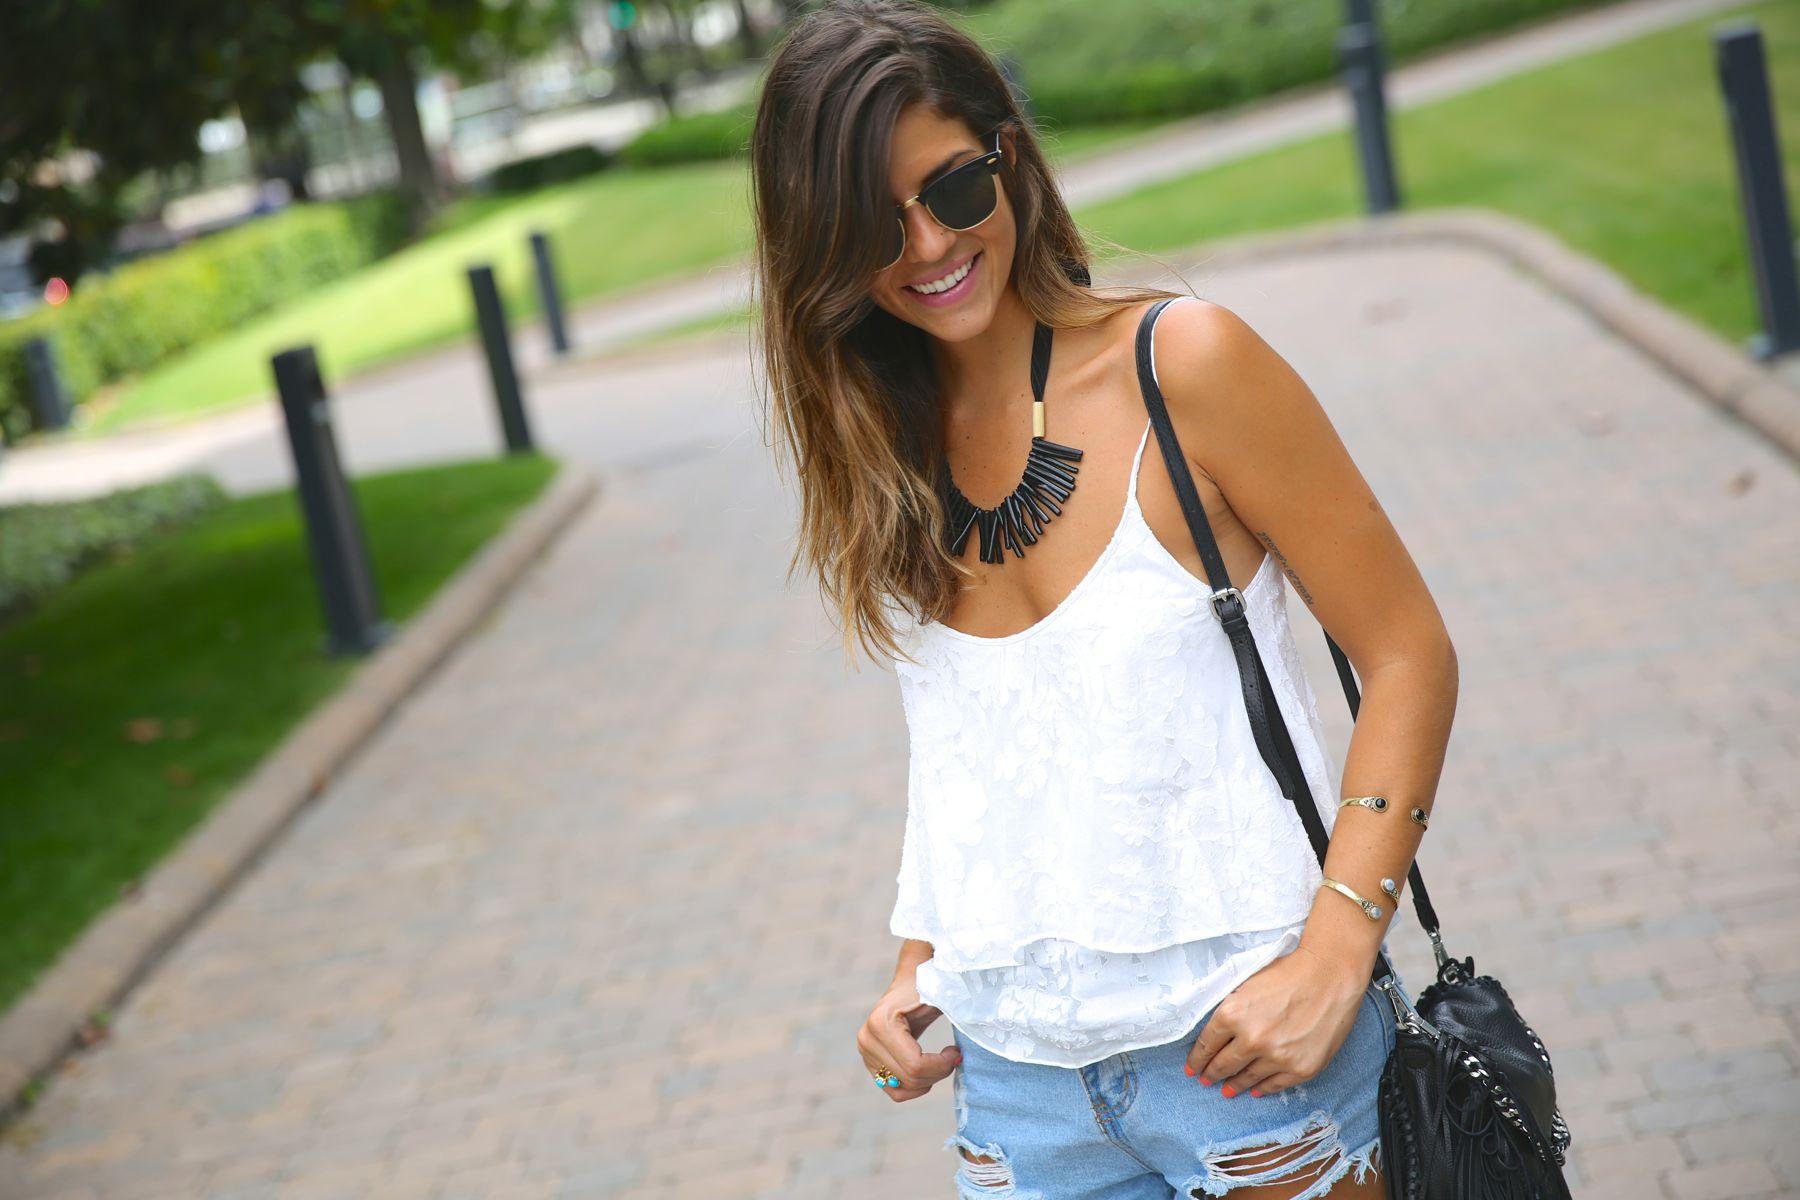 trendy_taste-look-outfit-street_style-ootd-blog-blogger-fashion_spain-moda_españa-fringed_bag-bolso_flecos-sandalias-verano-summer_sandals-ugg_australia-denim_shorts-shorts_vaqueros-oversize-5